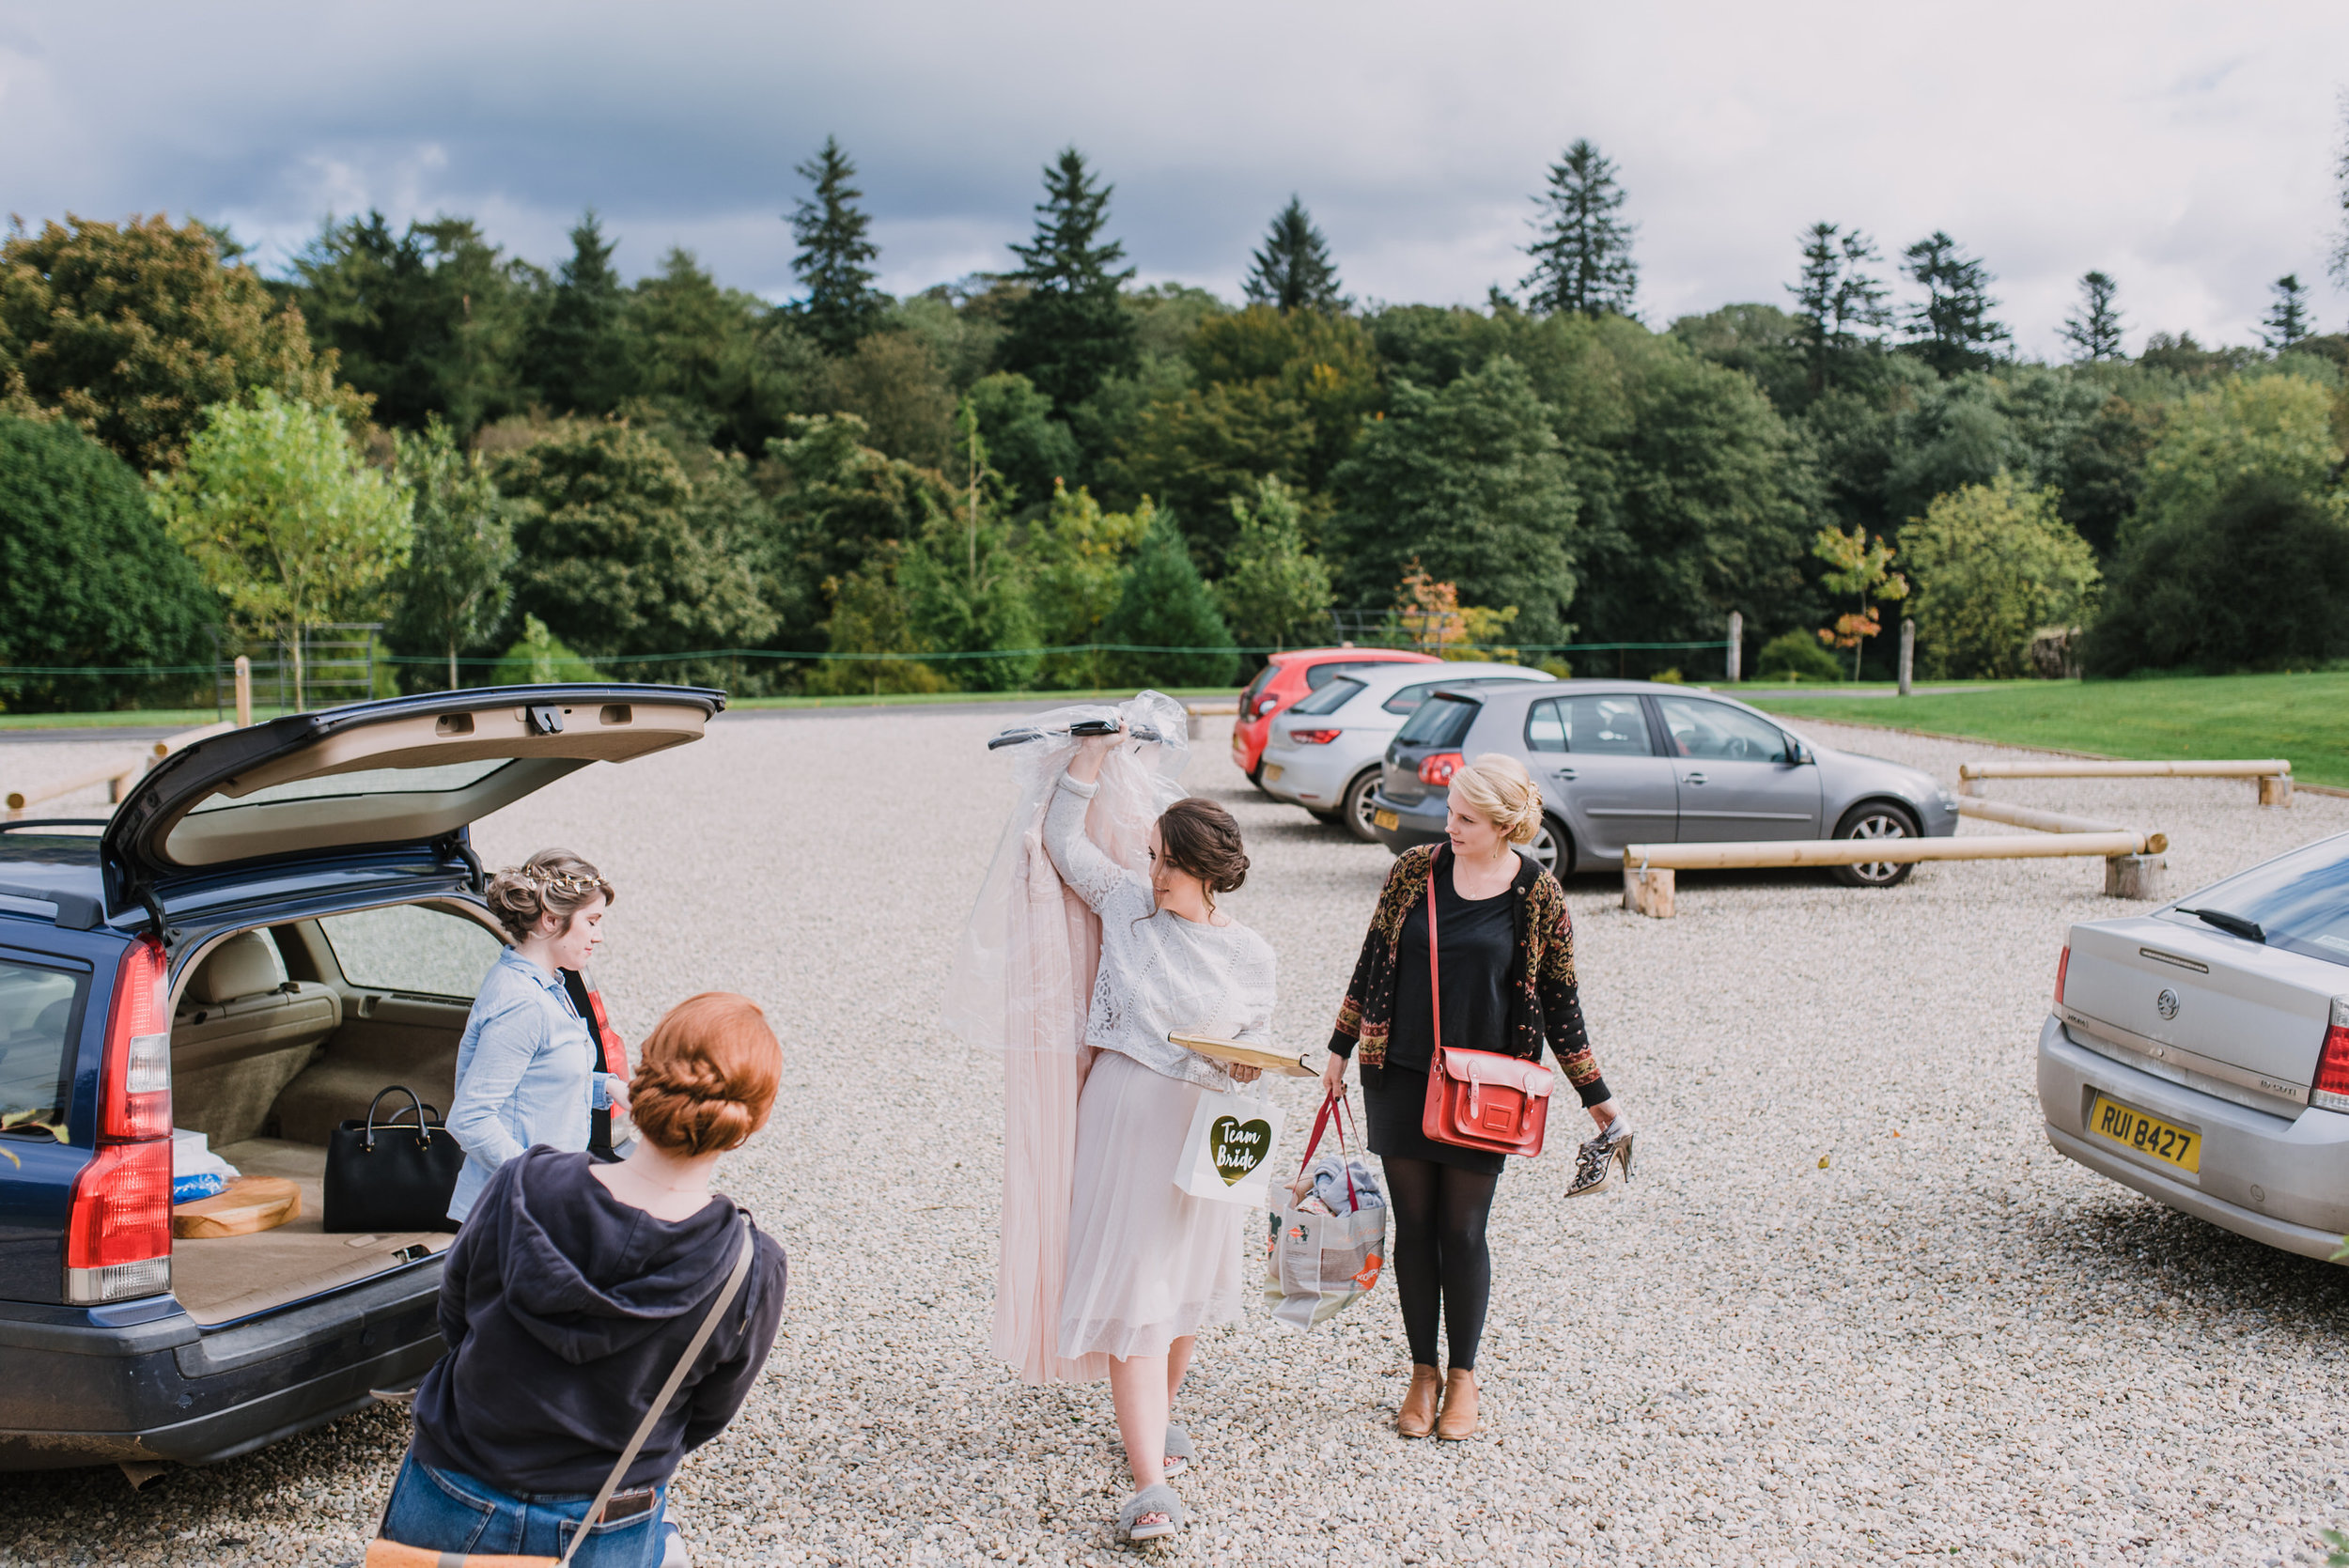 lissanoure castle wedding, northern ireland wedding photographer, romantic northern irish wedding venue, castle wedding ireland, natural wedding photography ni (19).jpg